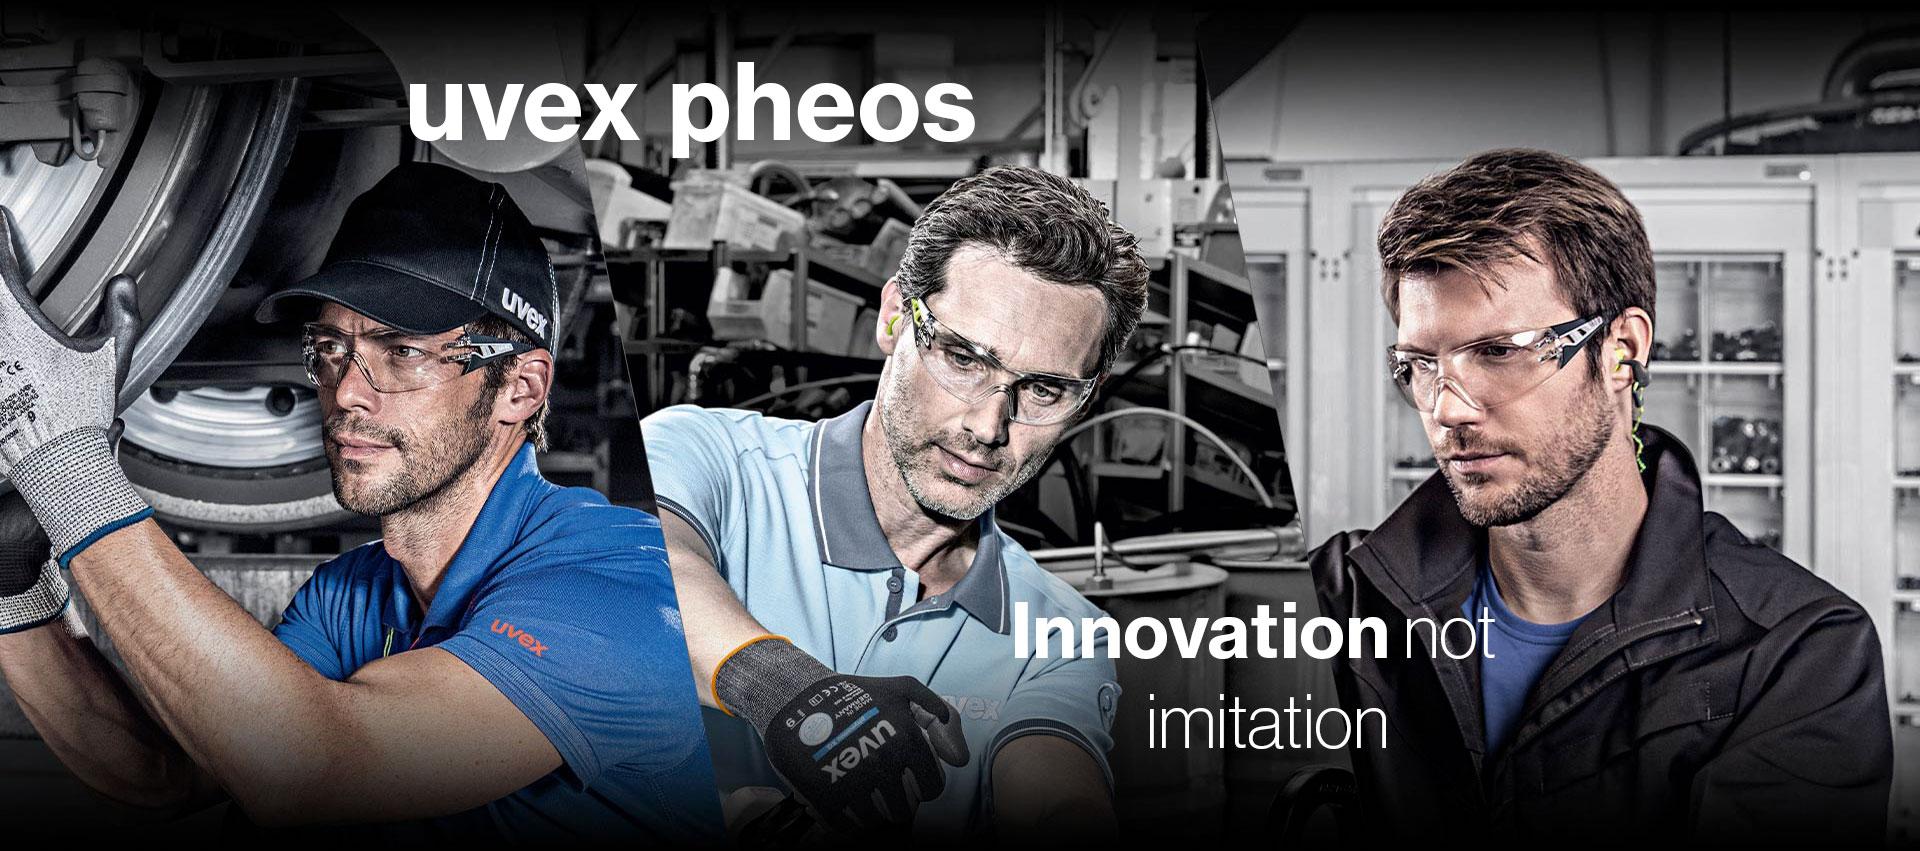 uvex pheos – Innovation not imitation